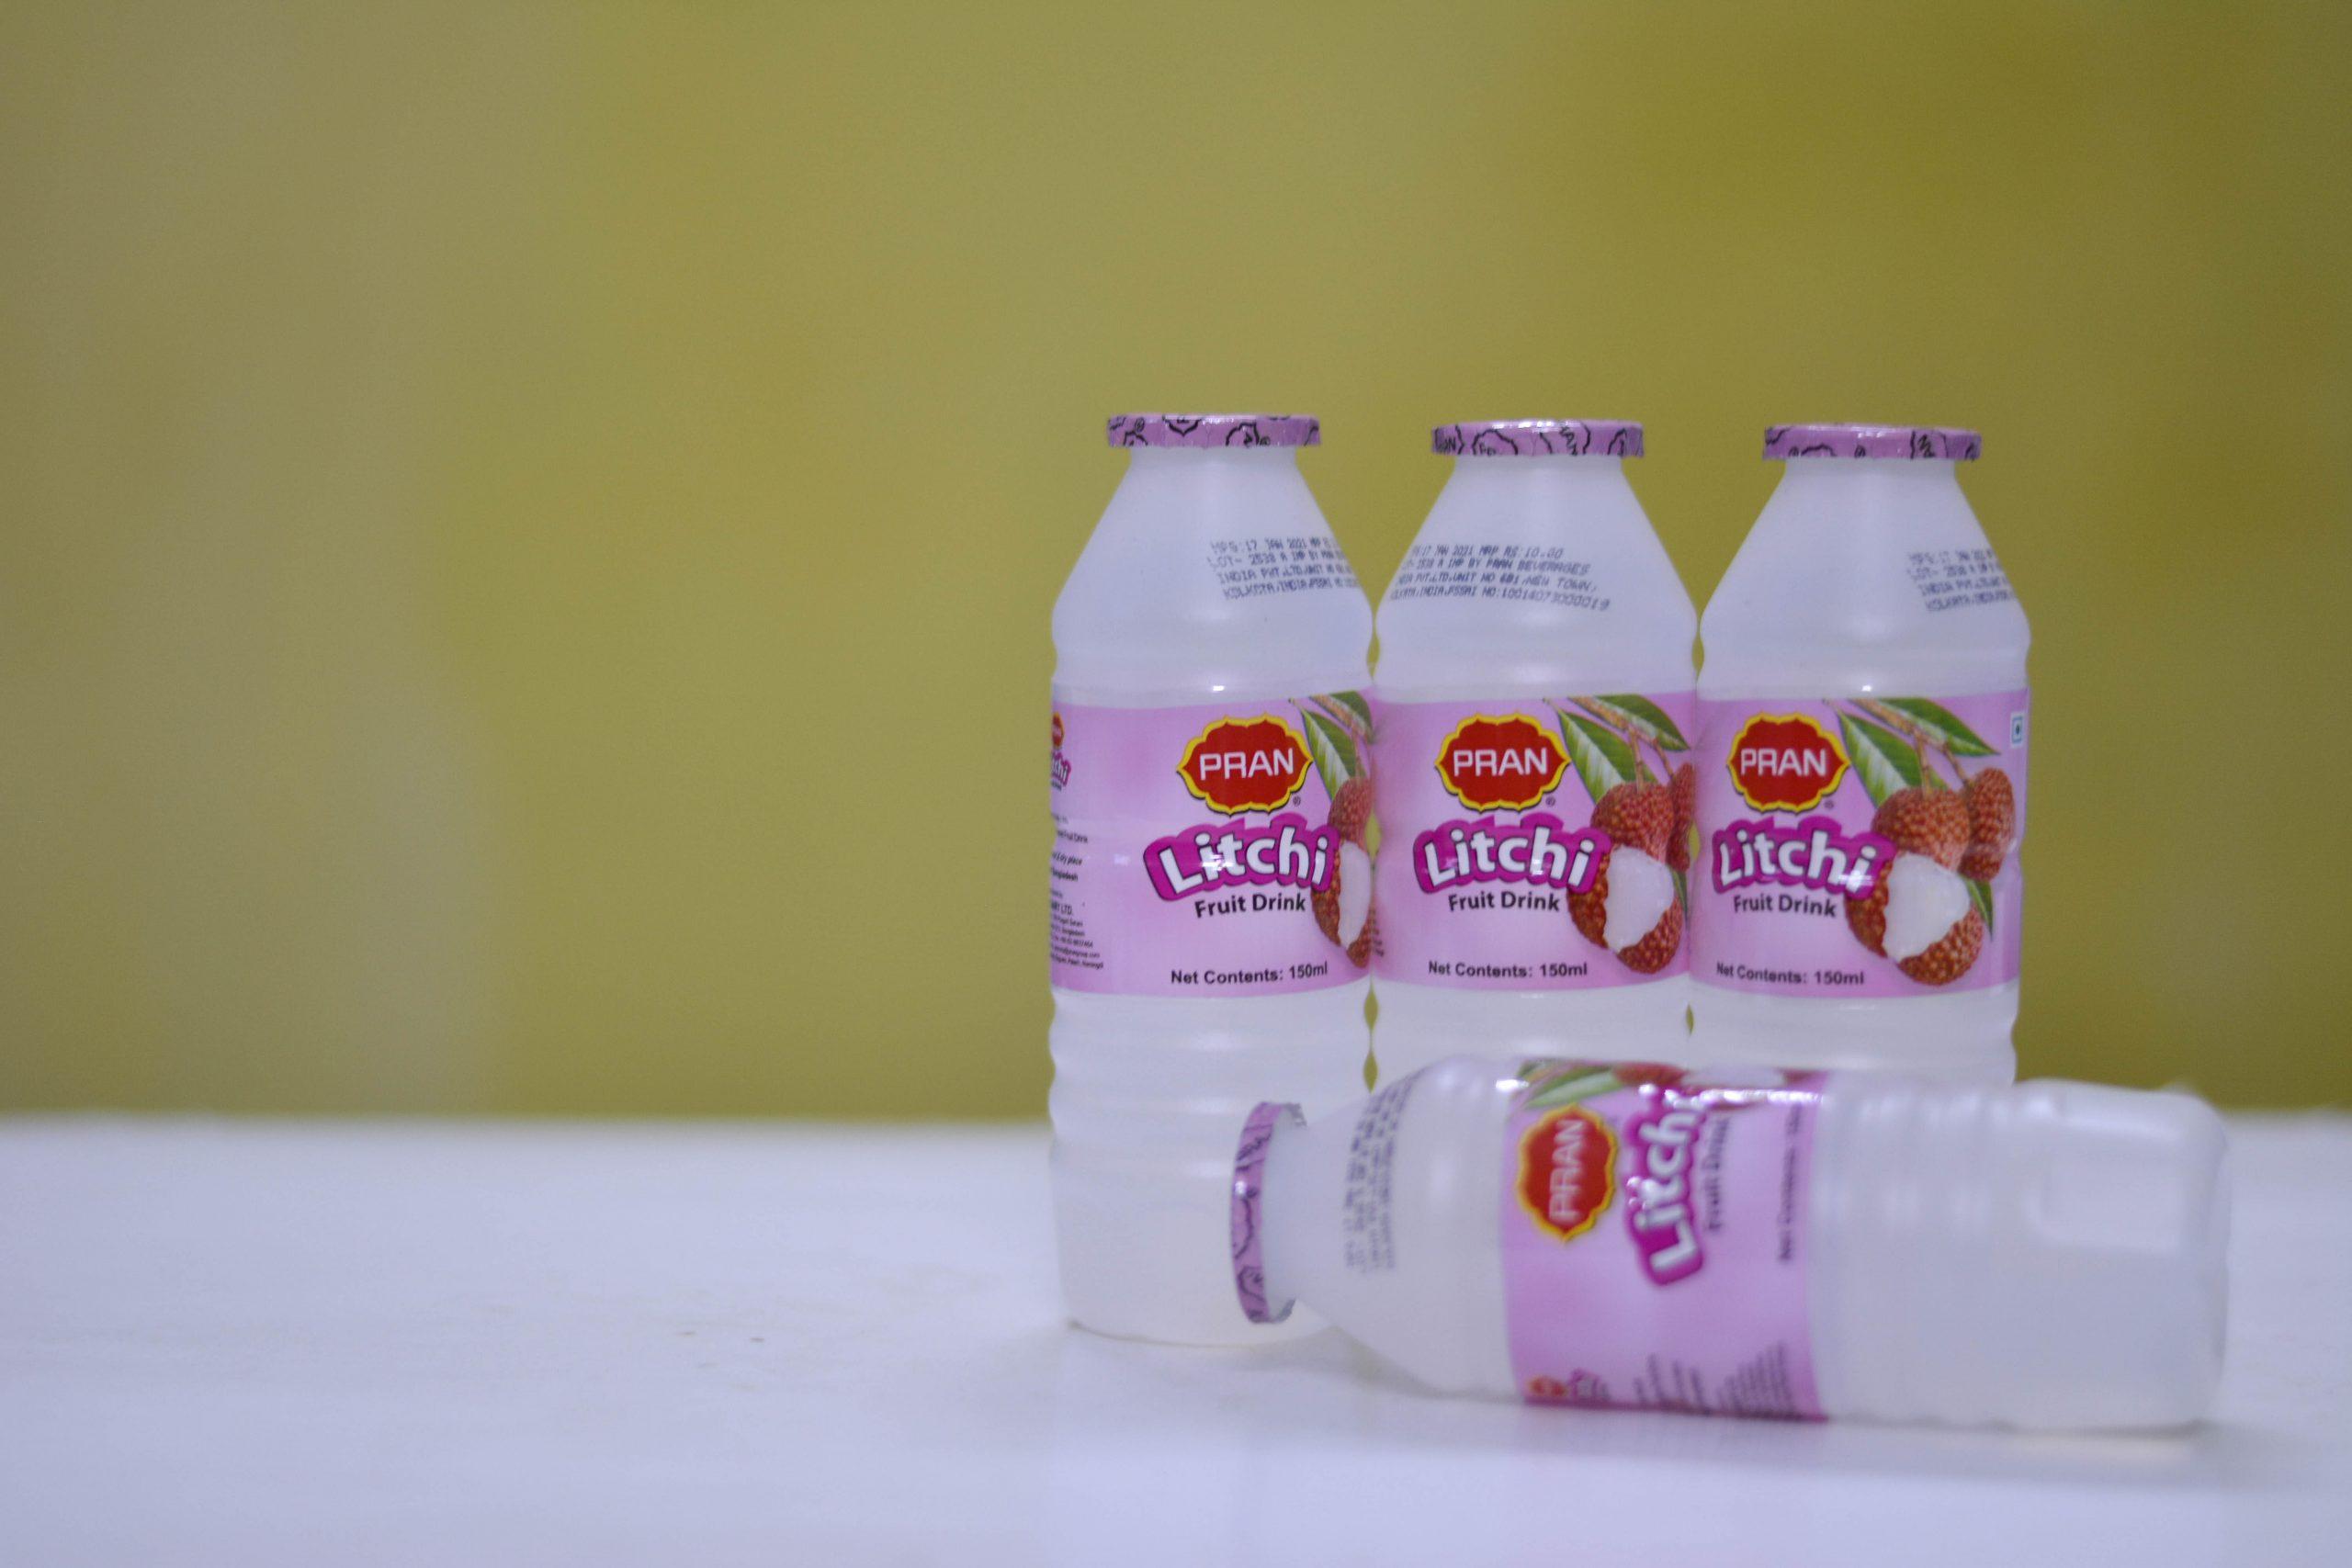 Packaged juice bottles